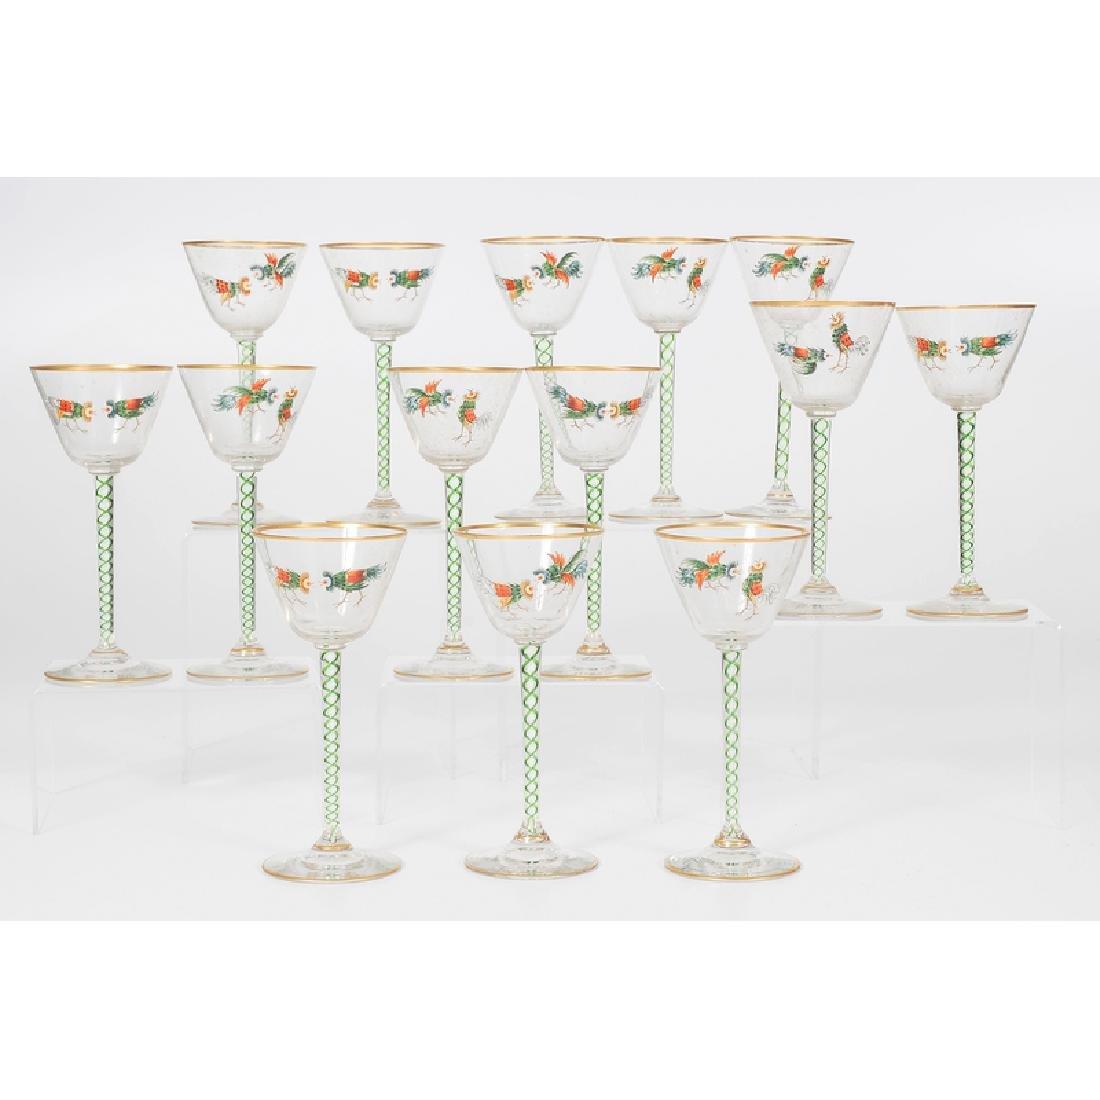 Threaded Glass Wine Glasses